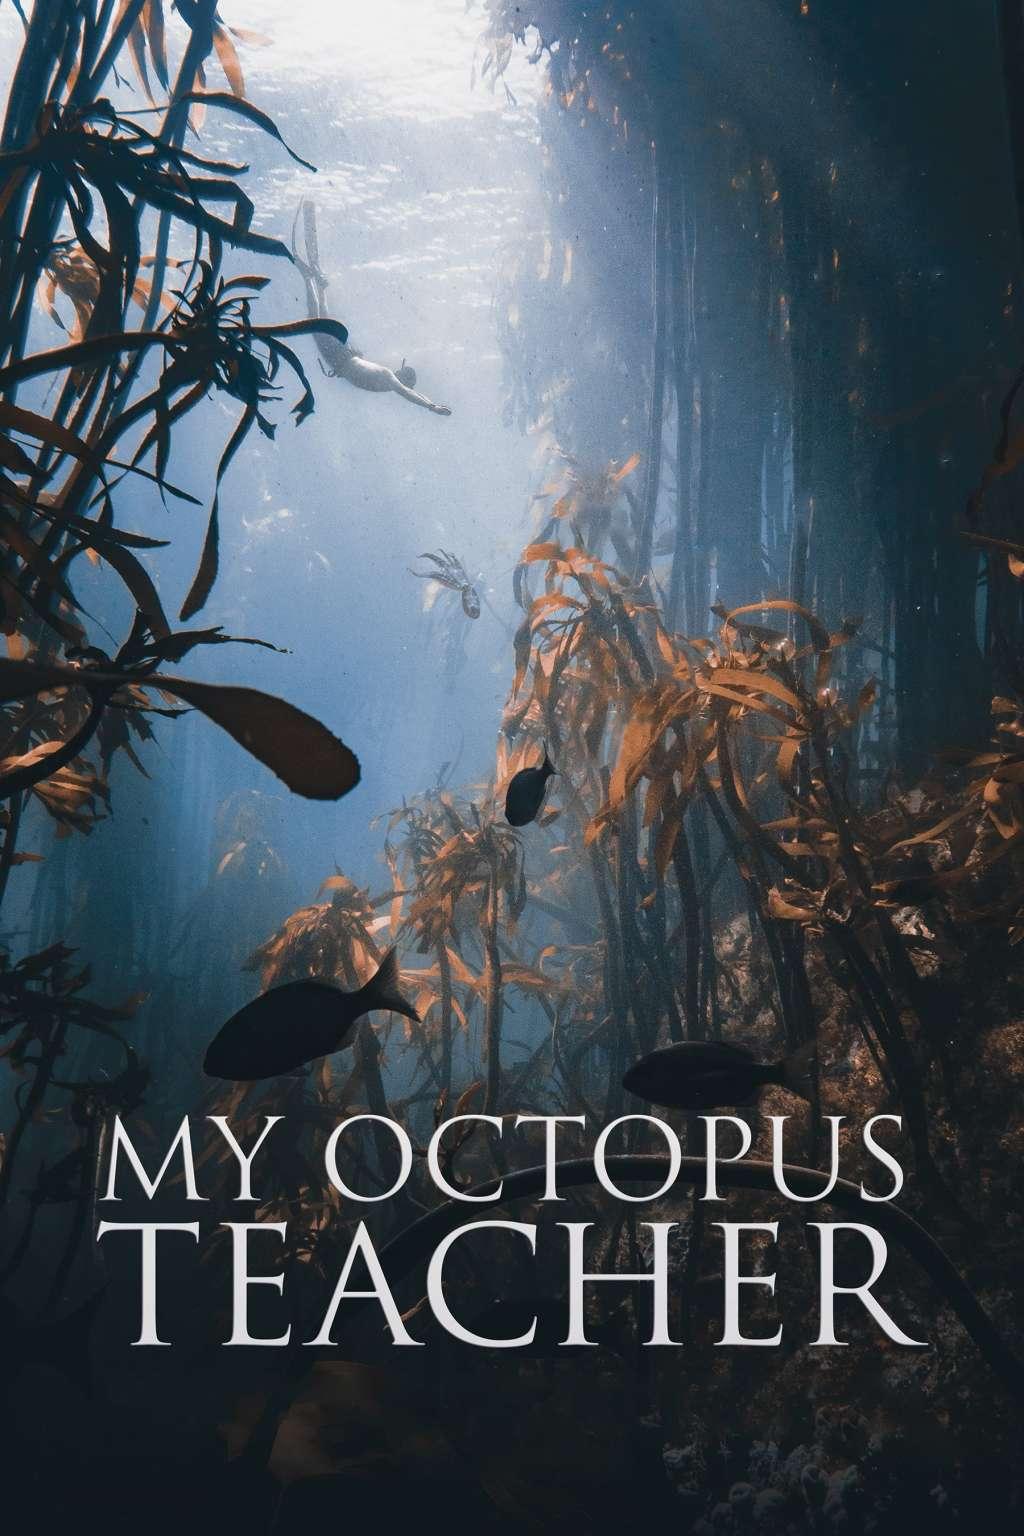 My Octopus Teacher kapak